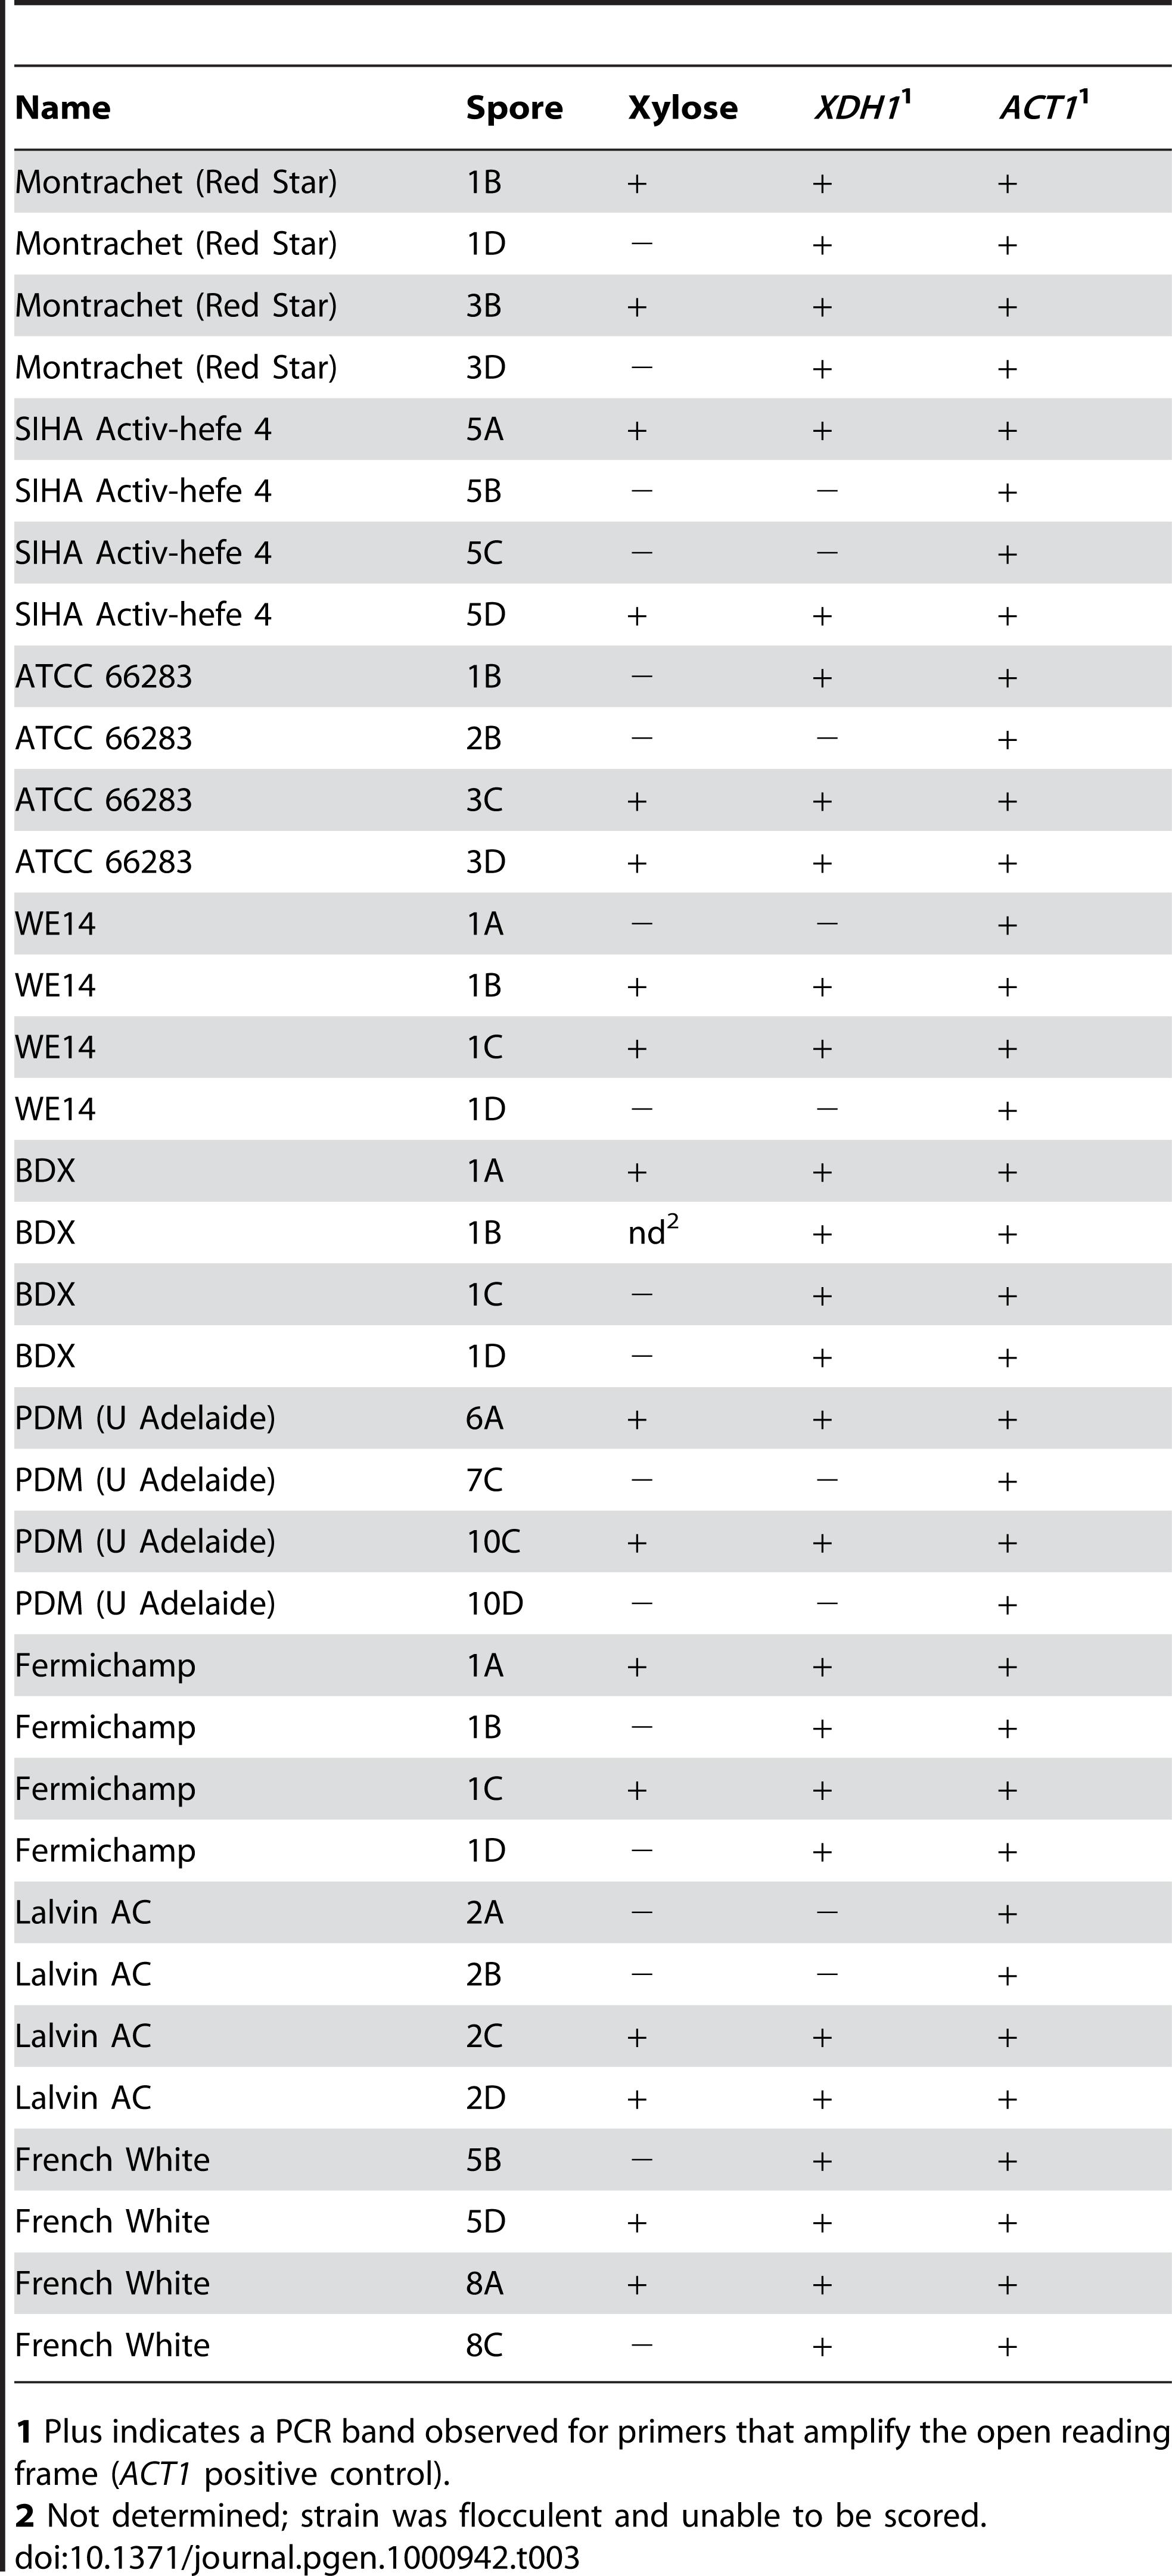 Presence of <i>XDH1</i> in xylose positive progeny.